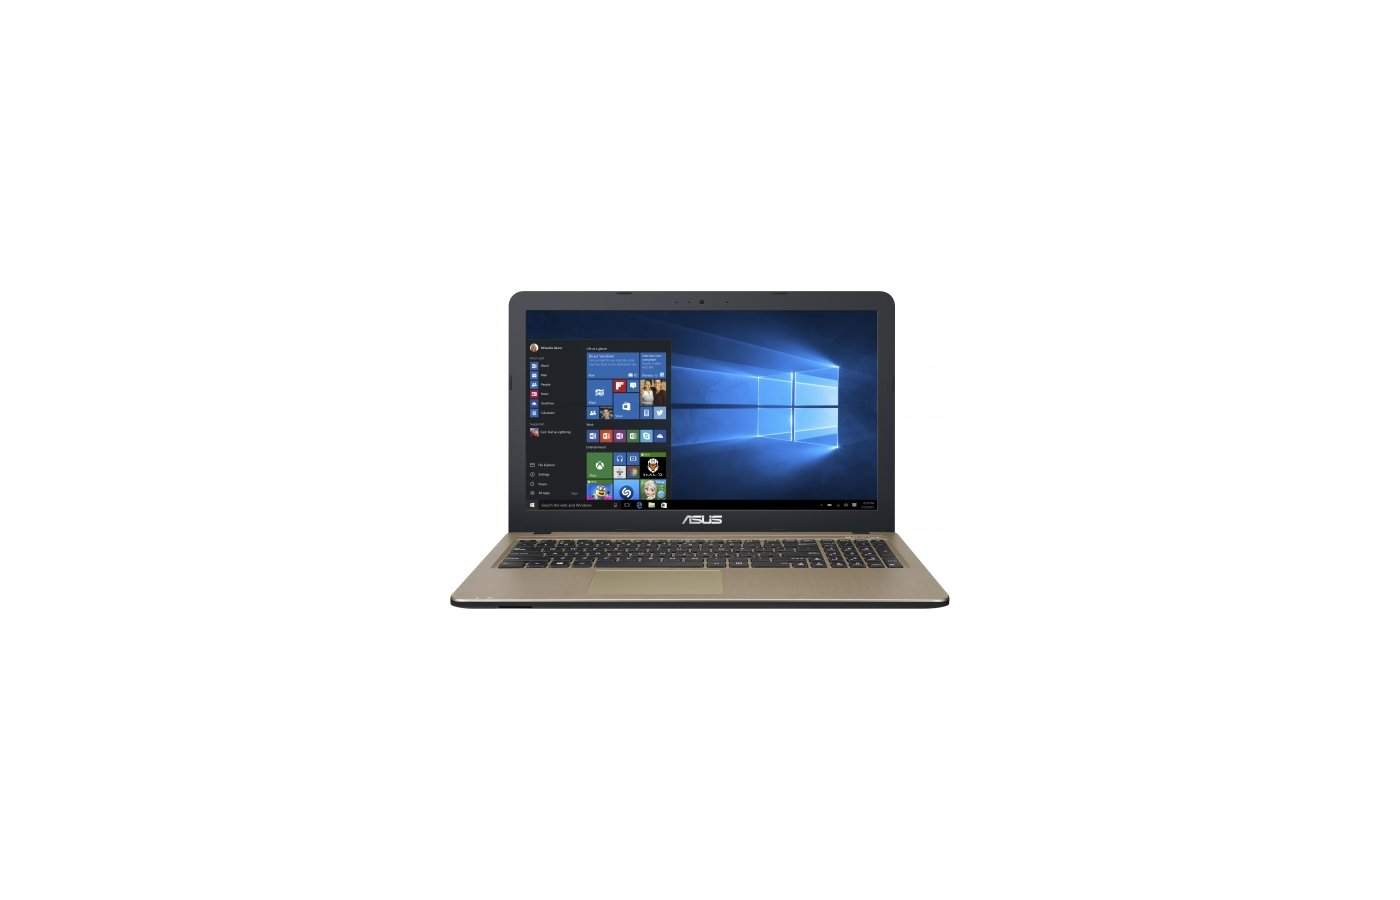 Ноутбук ASUS X540LJ-XX569T /90NB0B11-M08030/ intel i3 5005U/4Gb/500Gb/GF920 1Gb/DVDRW/15.6/WiFi/Win10